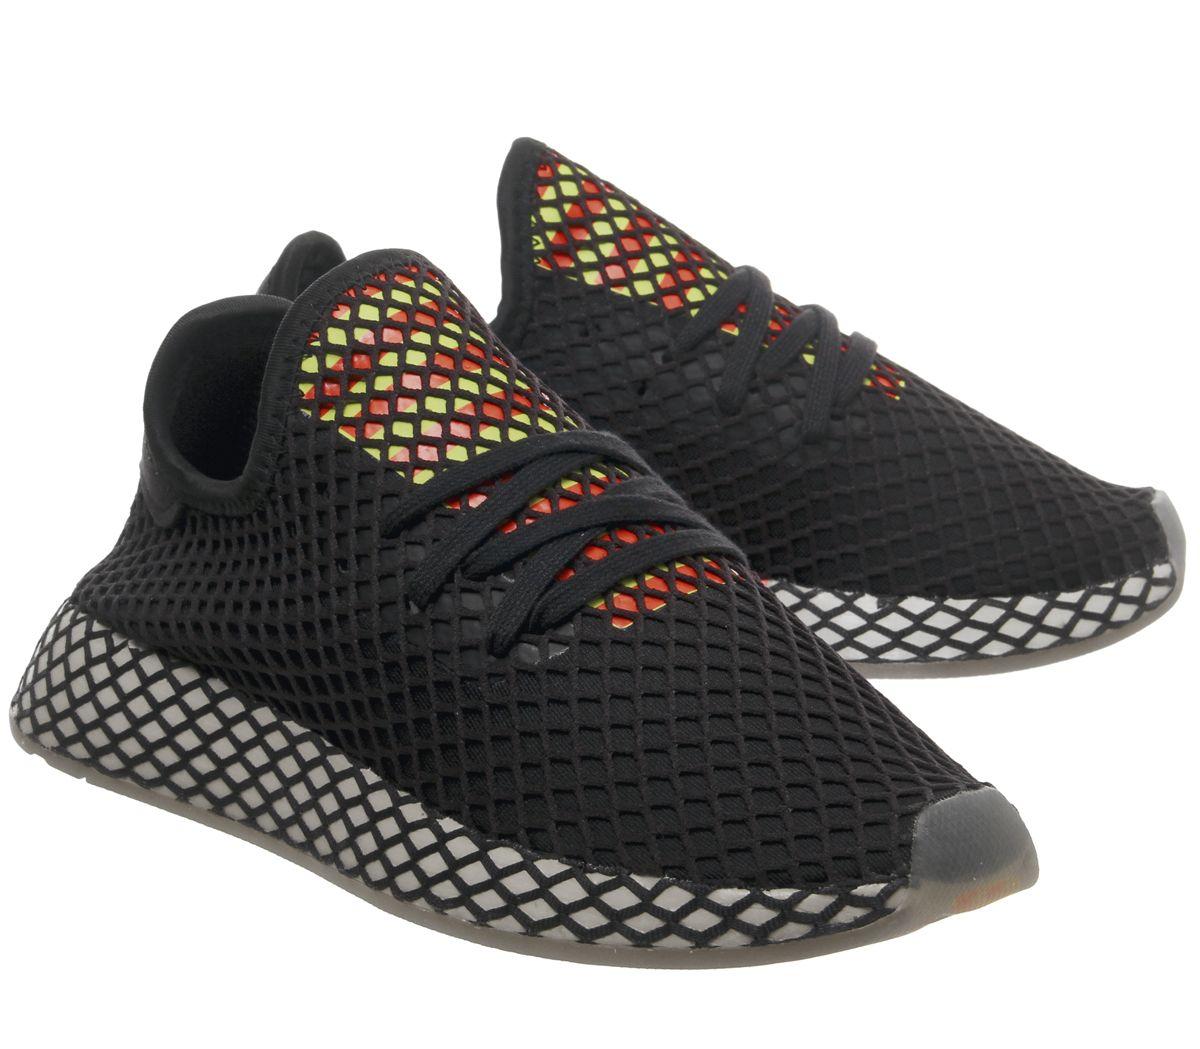 Mens-Adidas-Deerupt-Trainers-Core-Black-Sesame-Trainers-Shoes miniature 7